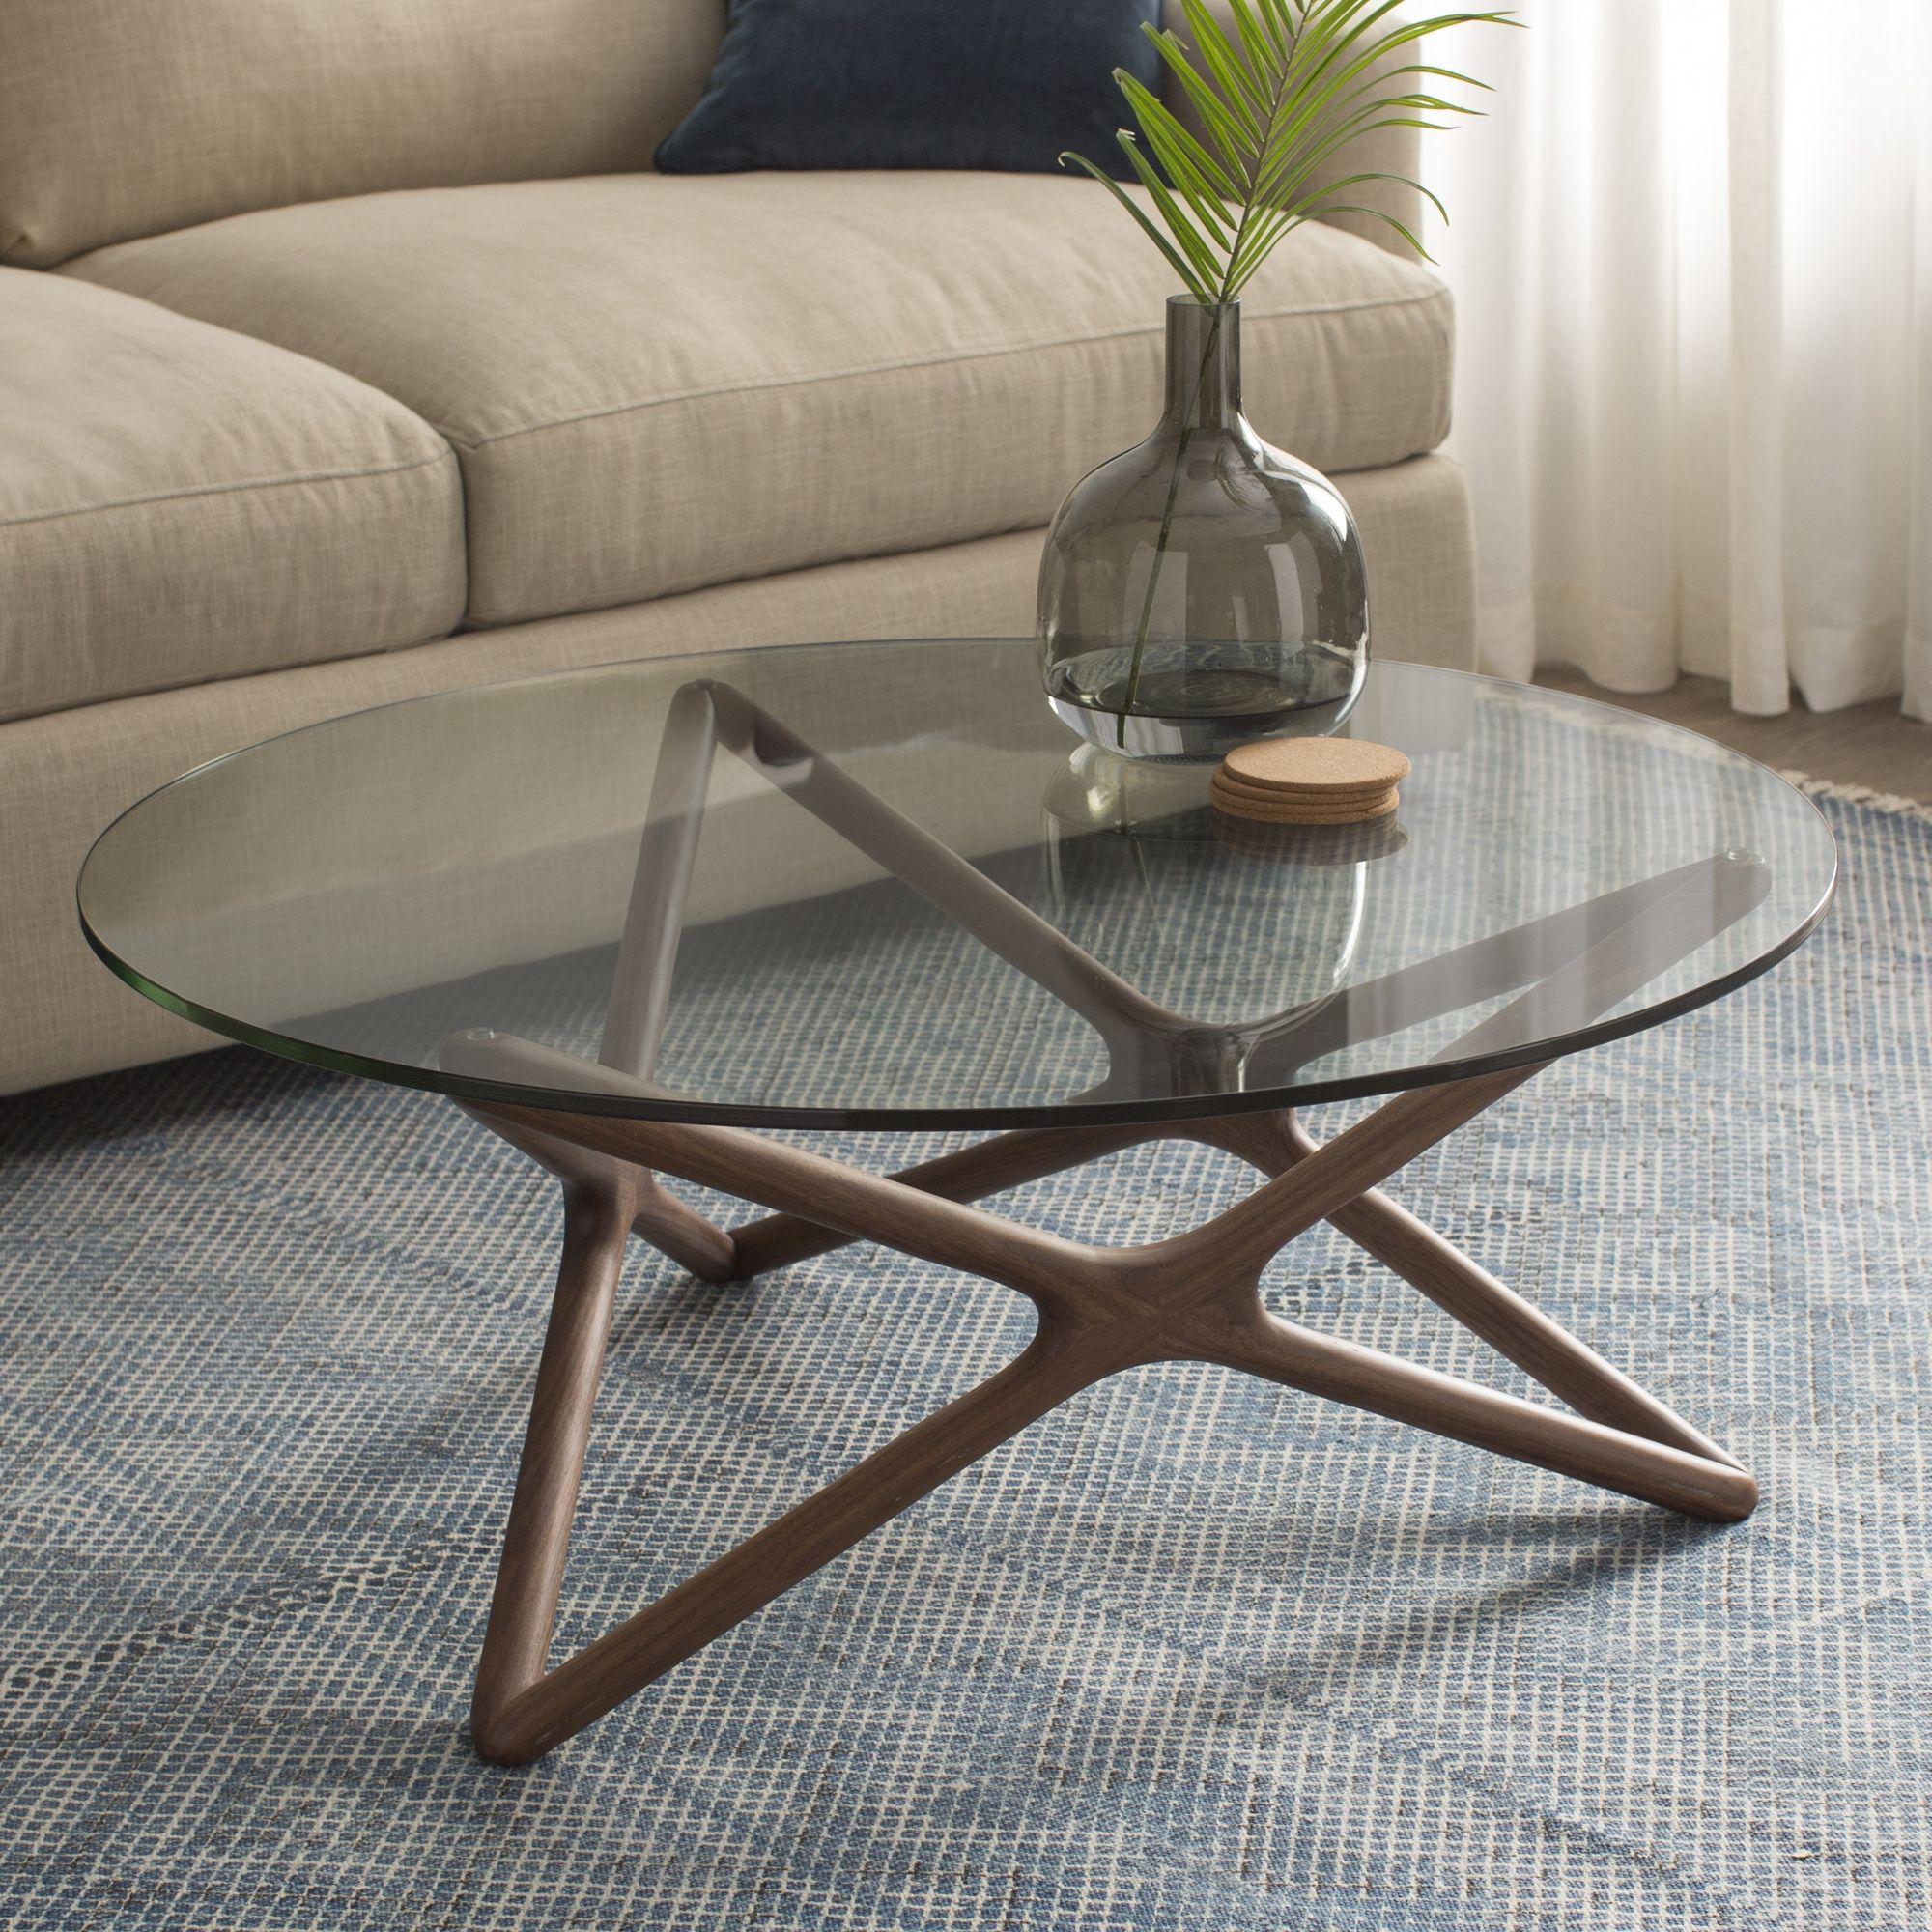 Meja Tamu Bundar Minimalis Bahan Kaca Round Glass Coffee Table Coffee Table Modern Glass Coffee Table